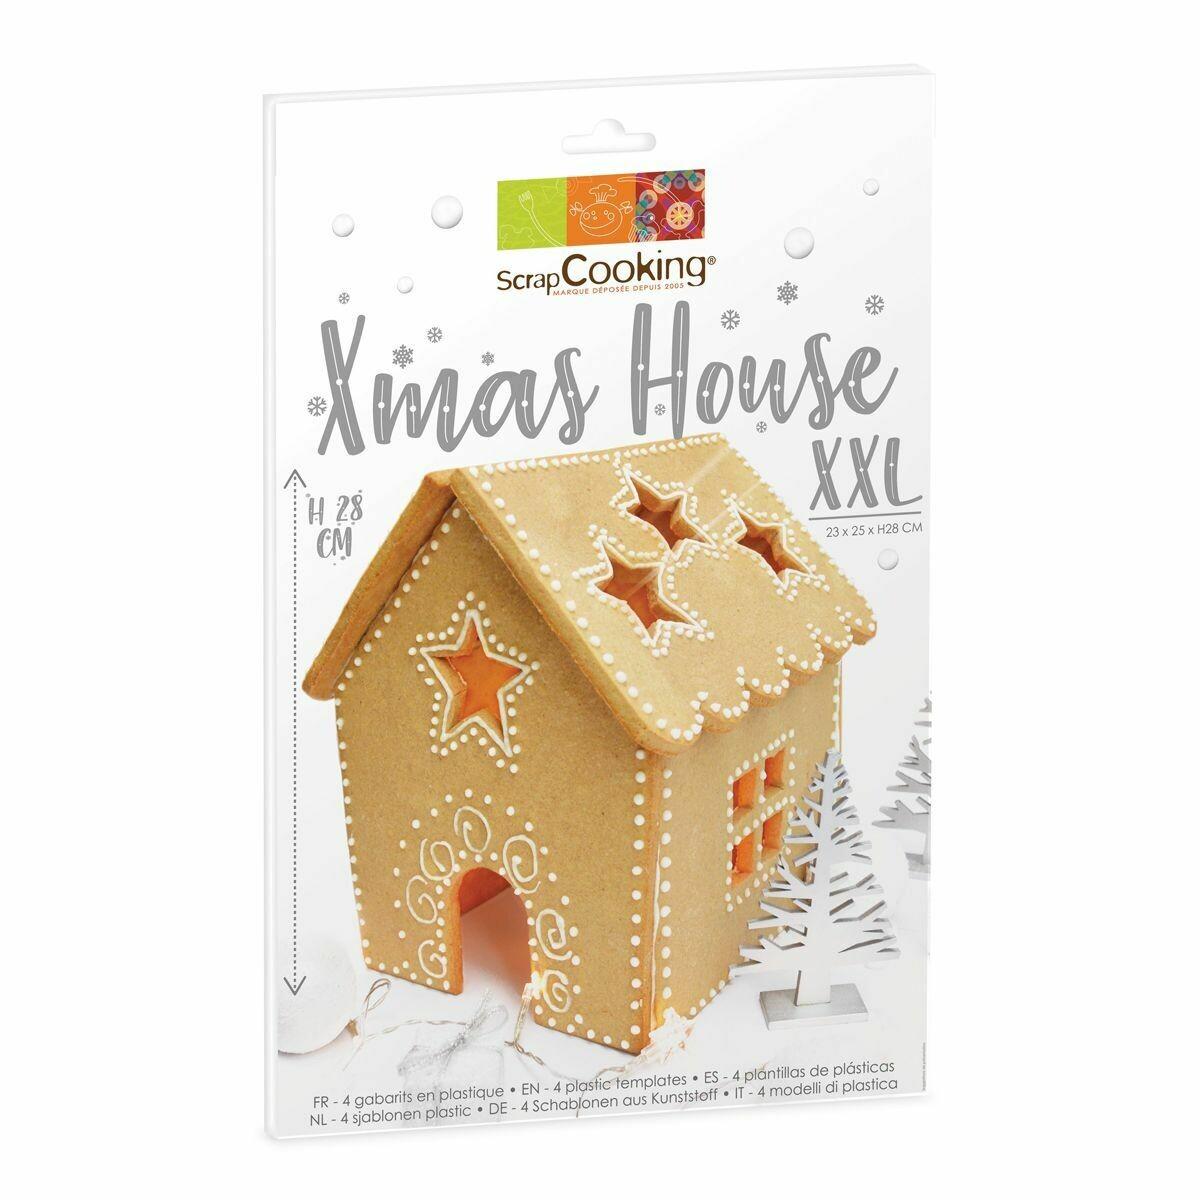 Scrapcooking Cookie Template XXL Xmas House Set of 4 - Σετ 4τεμ πλαστικά κουπ πατ για μεγάλο Μπισκοτόσπιτο